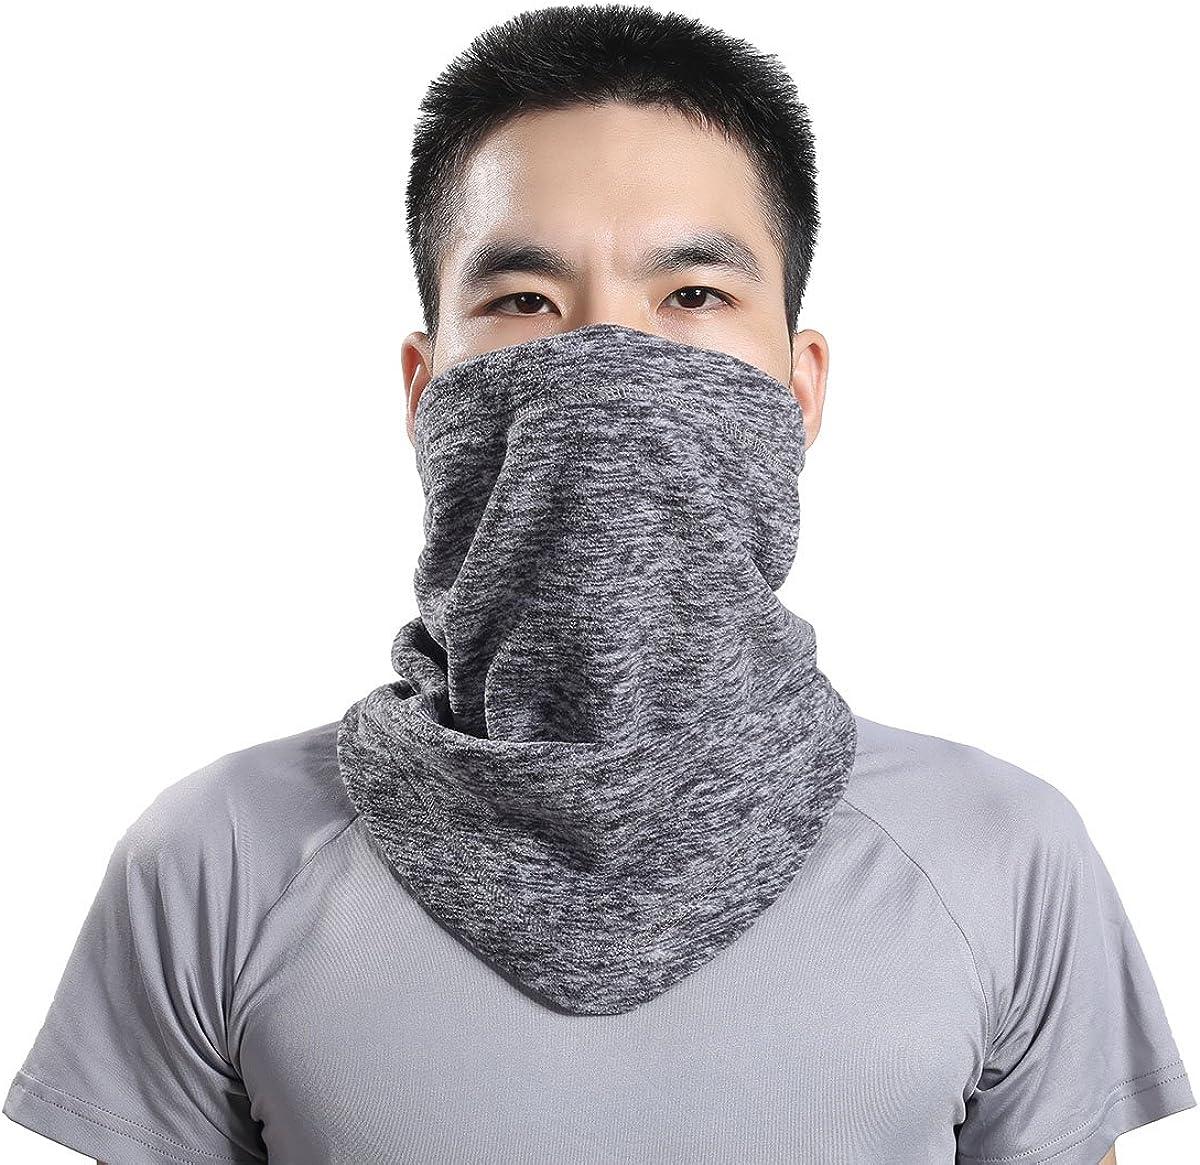 Neck Warmers Face Scarf Neck Gaiter Face Bandana /& Face Cover Windproof Neck Cover Balaclava Face Mask